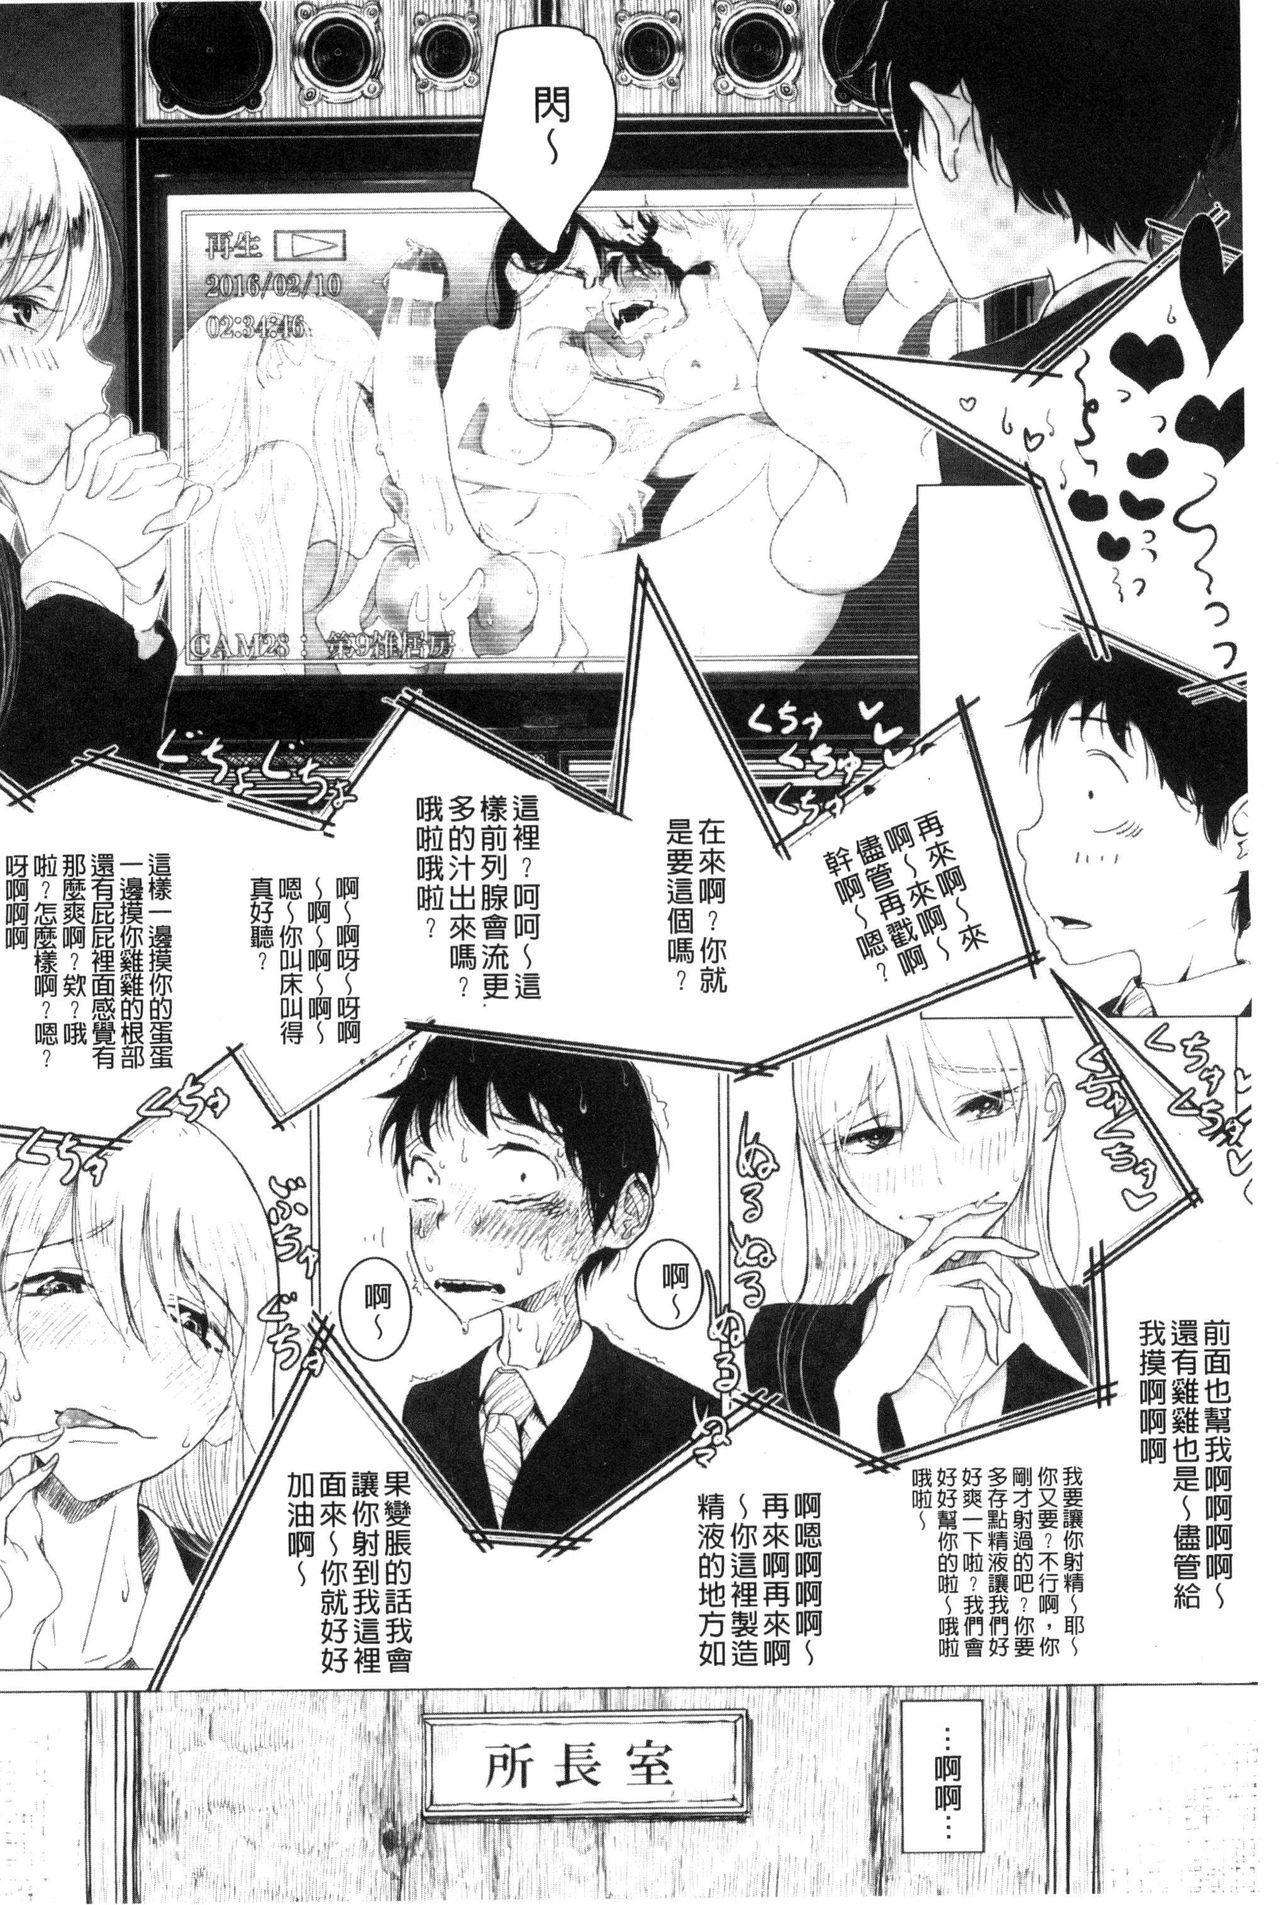 [Dhibi] Sono Yubisaki de Korogashite - Please Caress it at the Finger-tip. [Chinese] 169